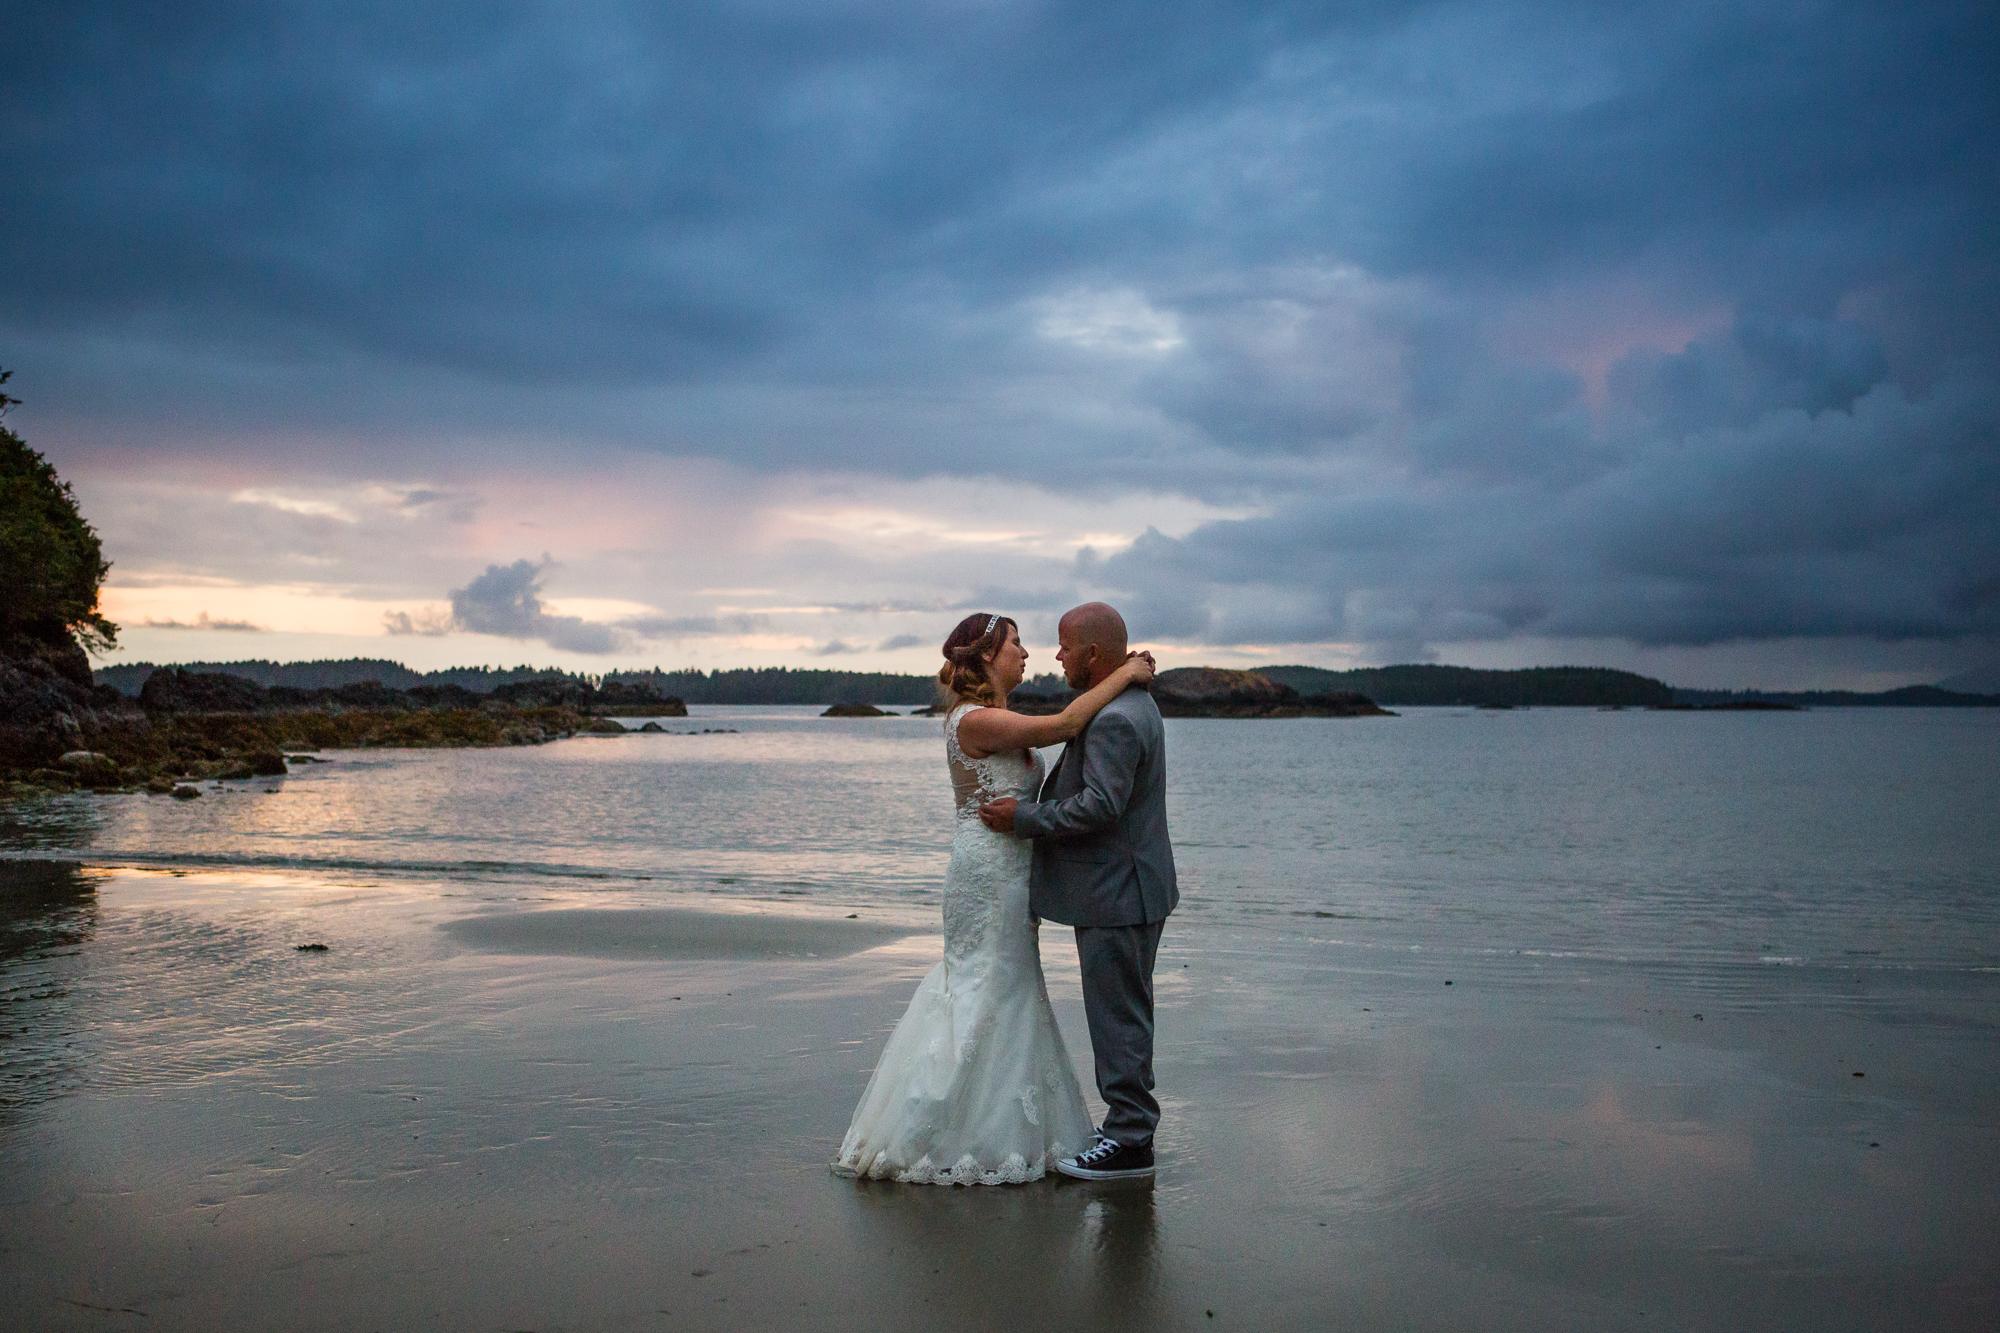 mackenzie beach sunset wedding photos